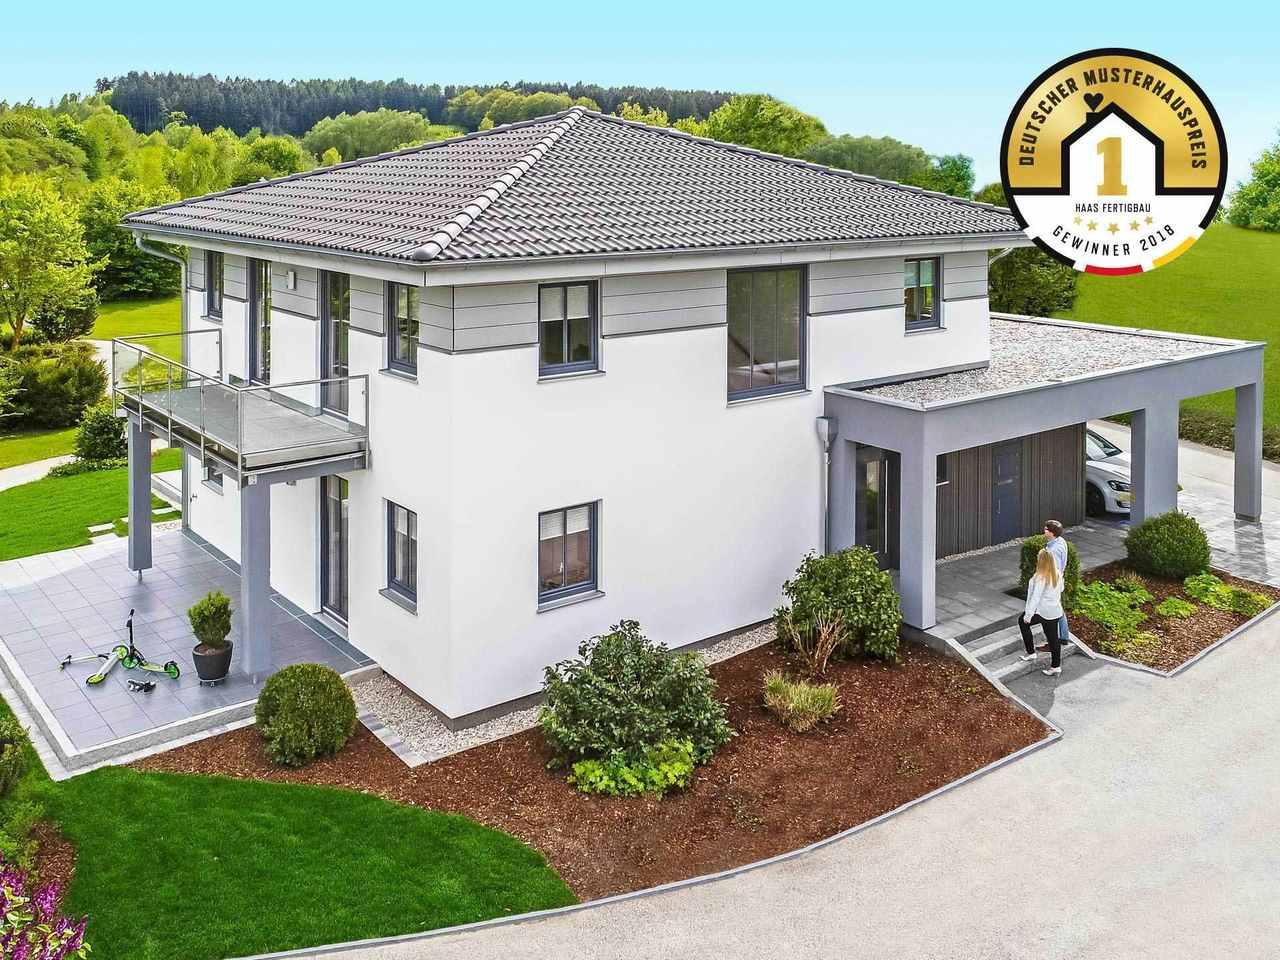 Kategorie Newcomer Platz 1 Musterhaus Falkenberg 150